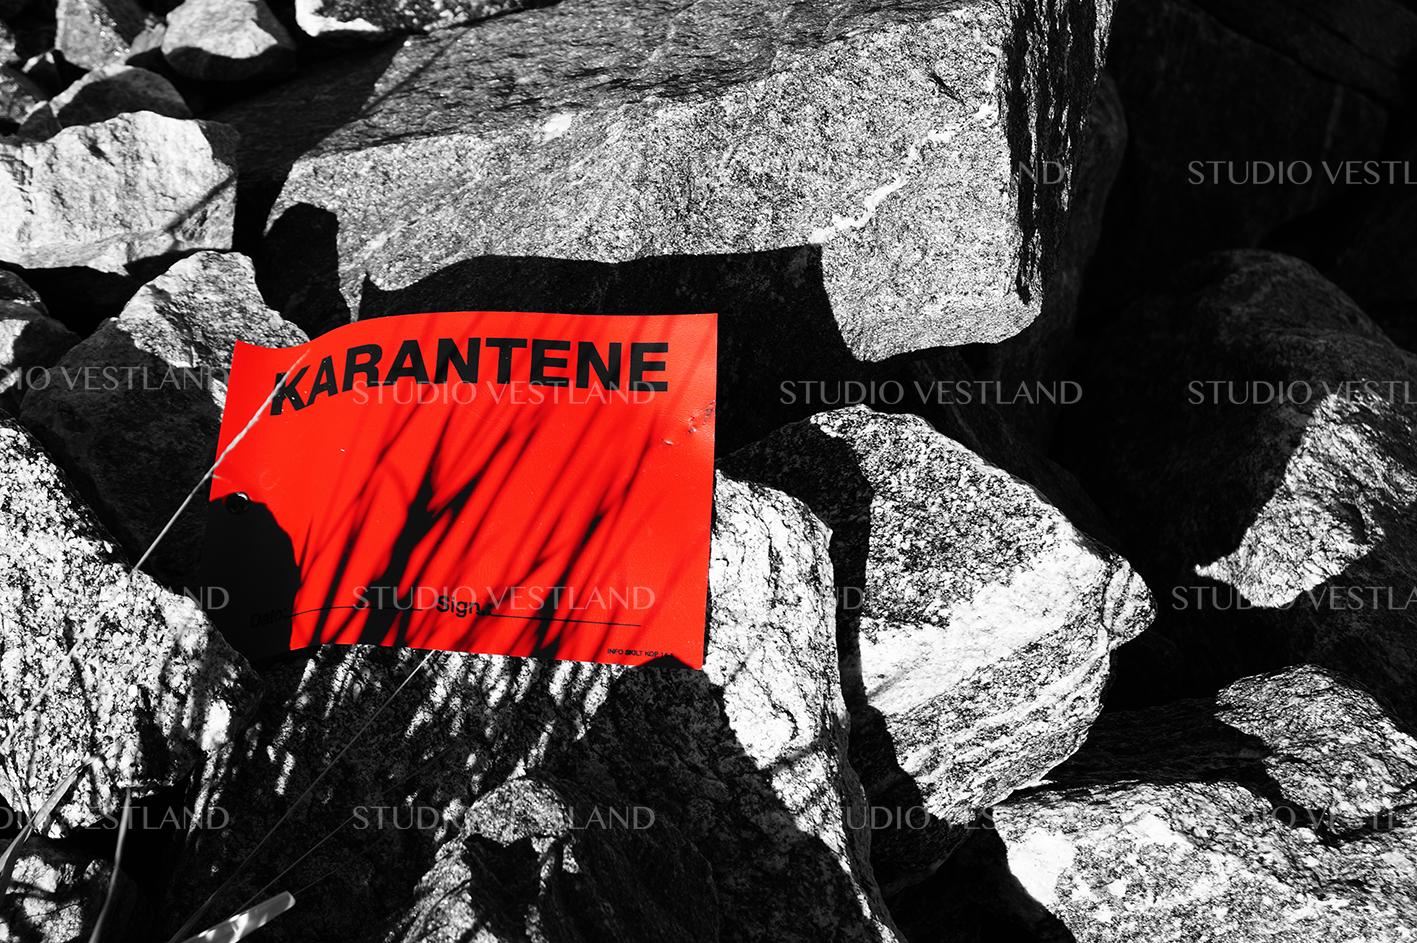 Studio Vestland - Karantene 02